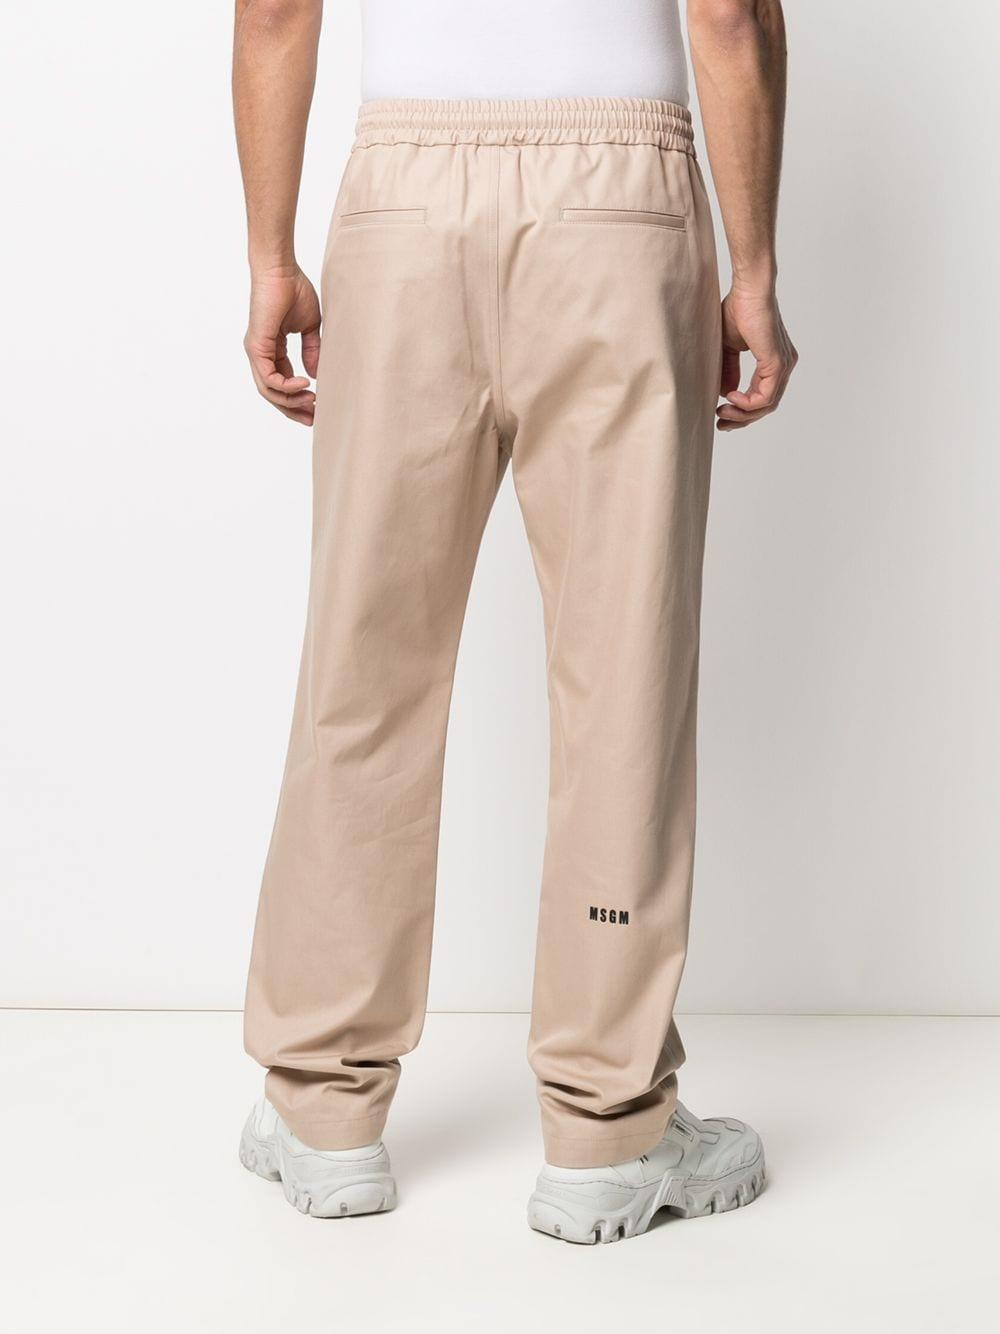 COTTON TRACK PANTS MSGM | Trousers | 3040MP01X 21710523